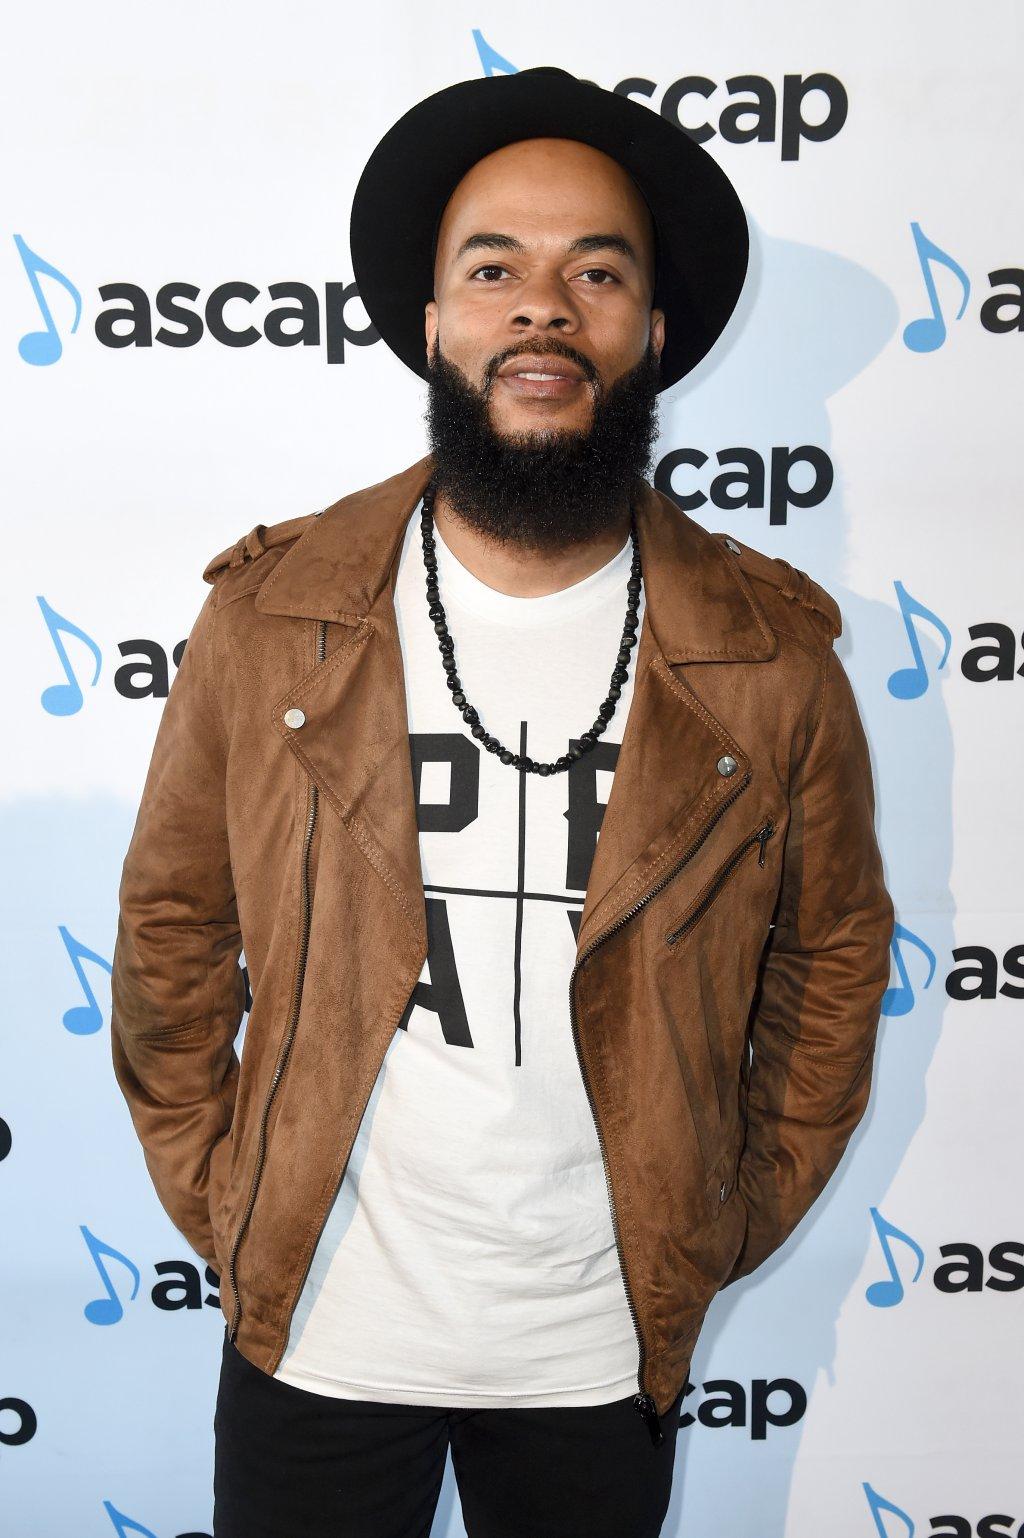 ASCAP Grammy Nominees Reception 2018 - Arrivals